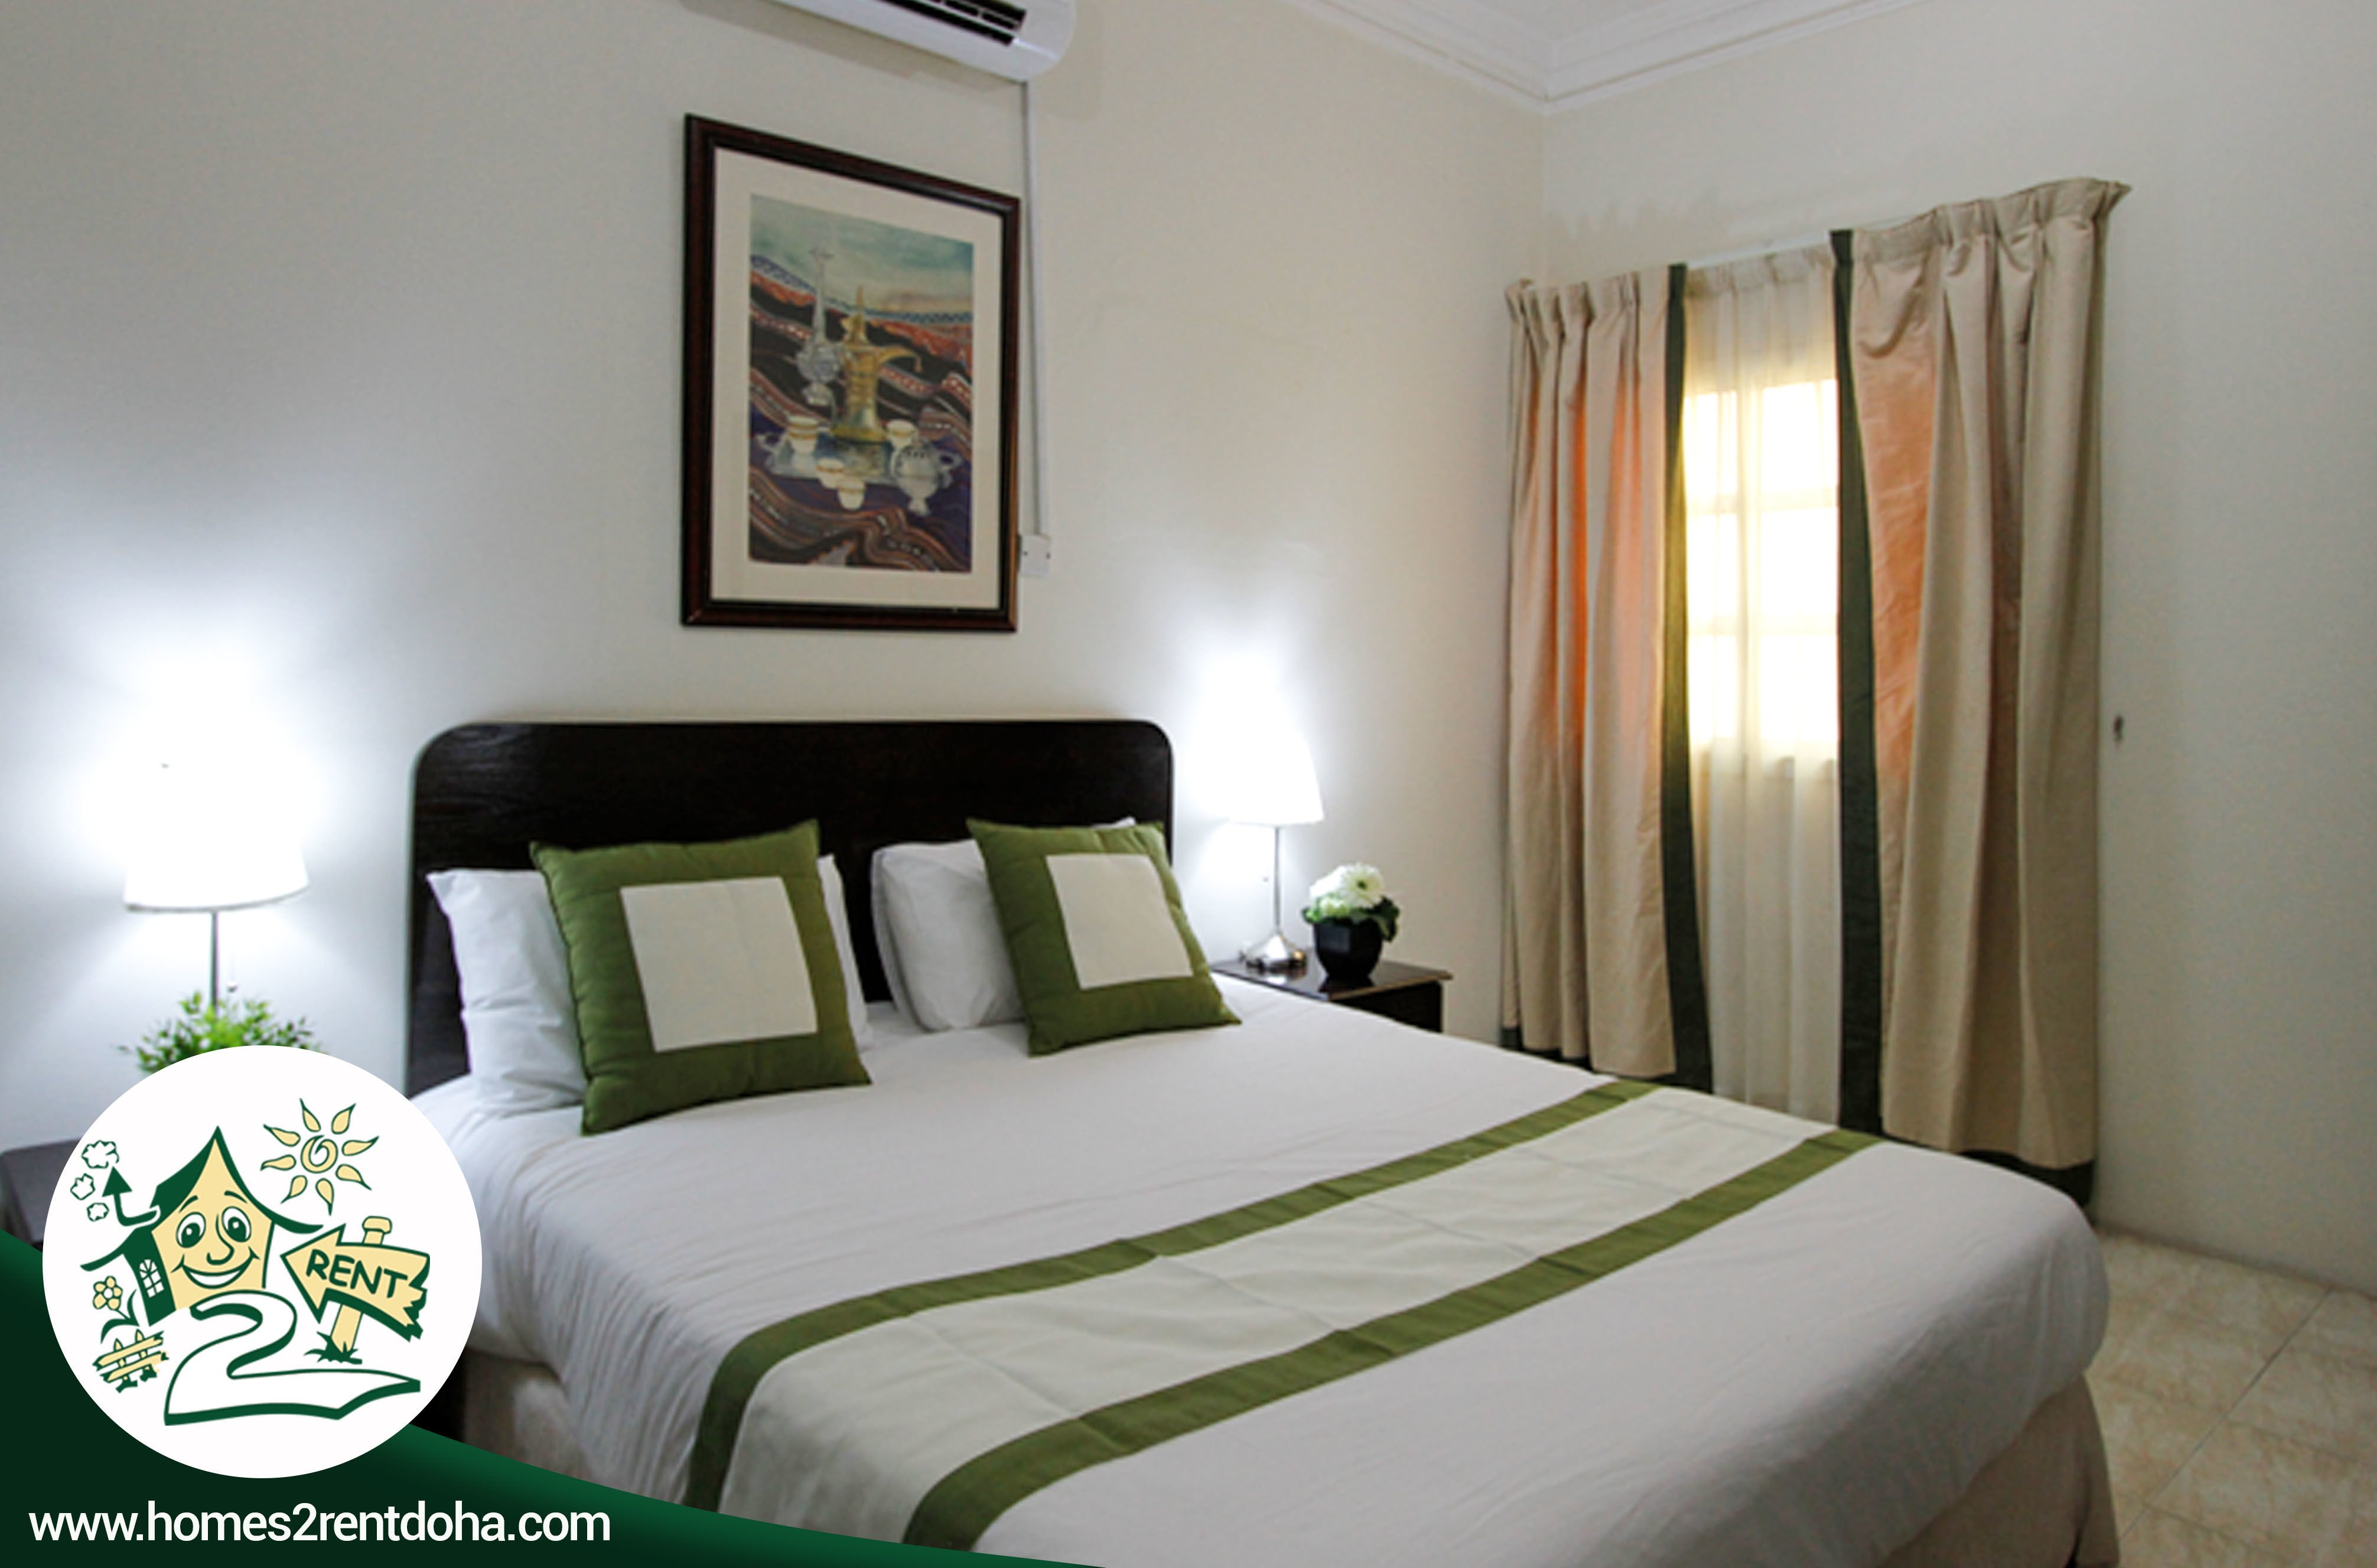 Available soon f f 2br apt madinat khalifa - Available two bedroom apartments ...